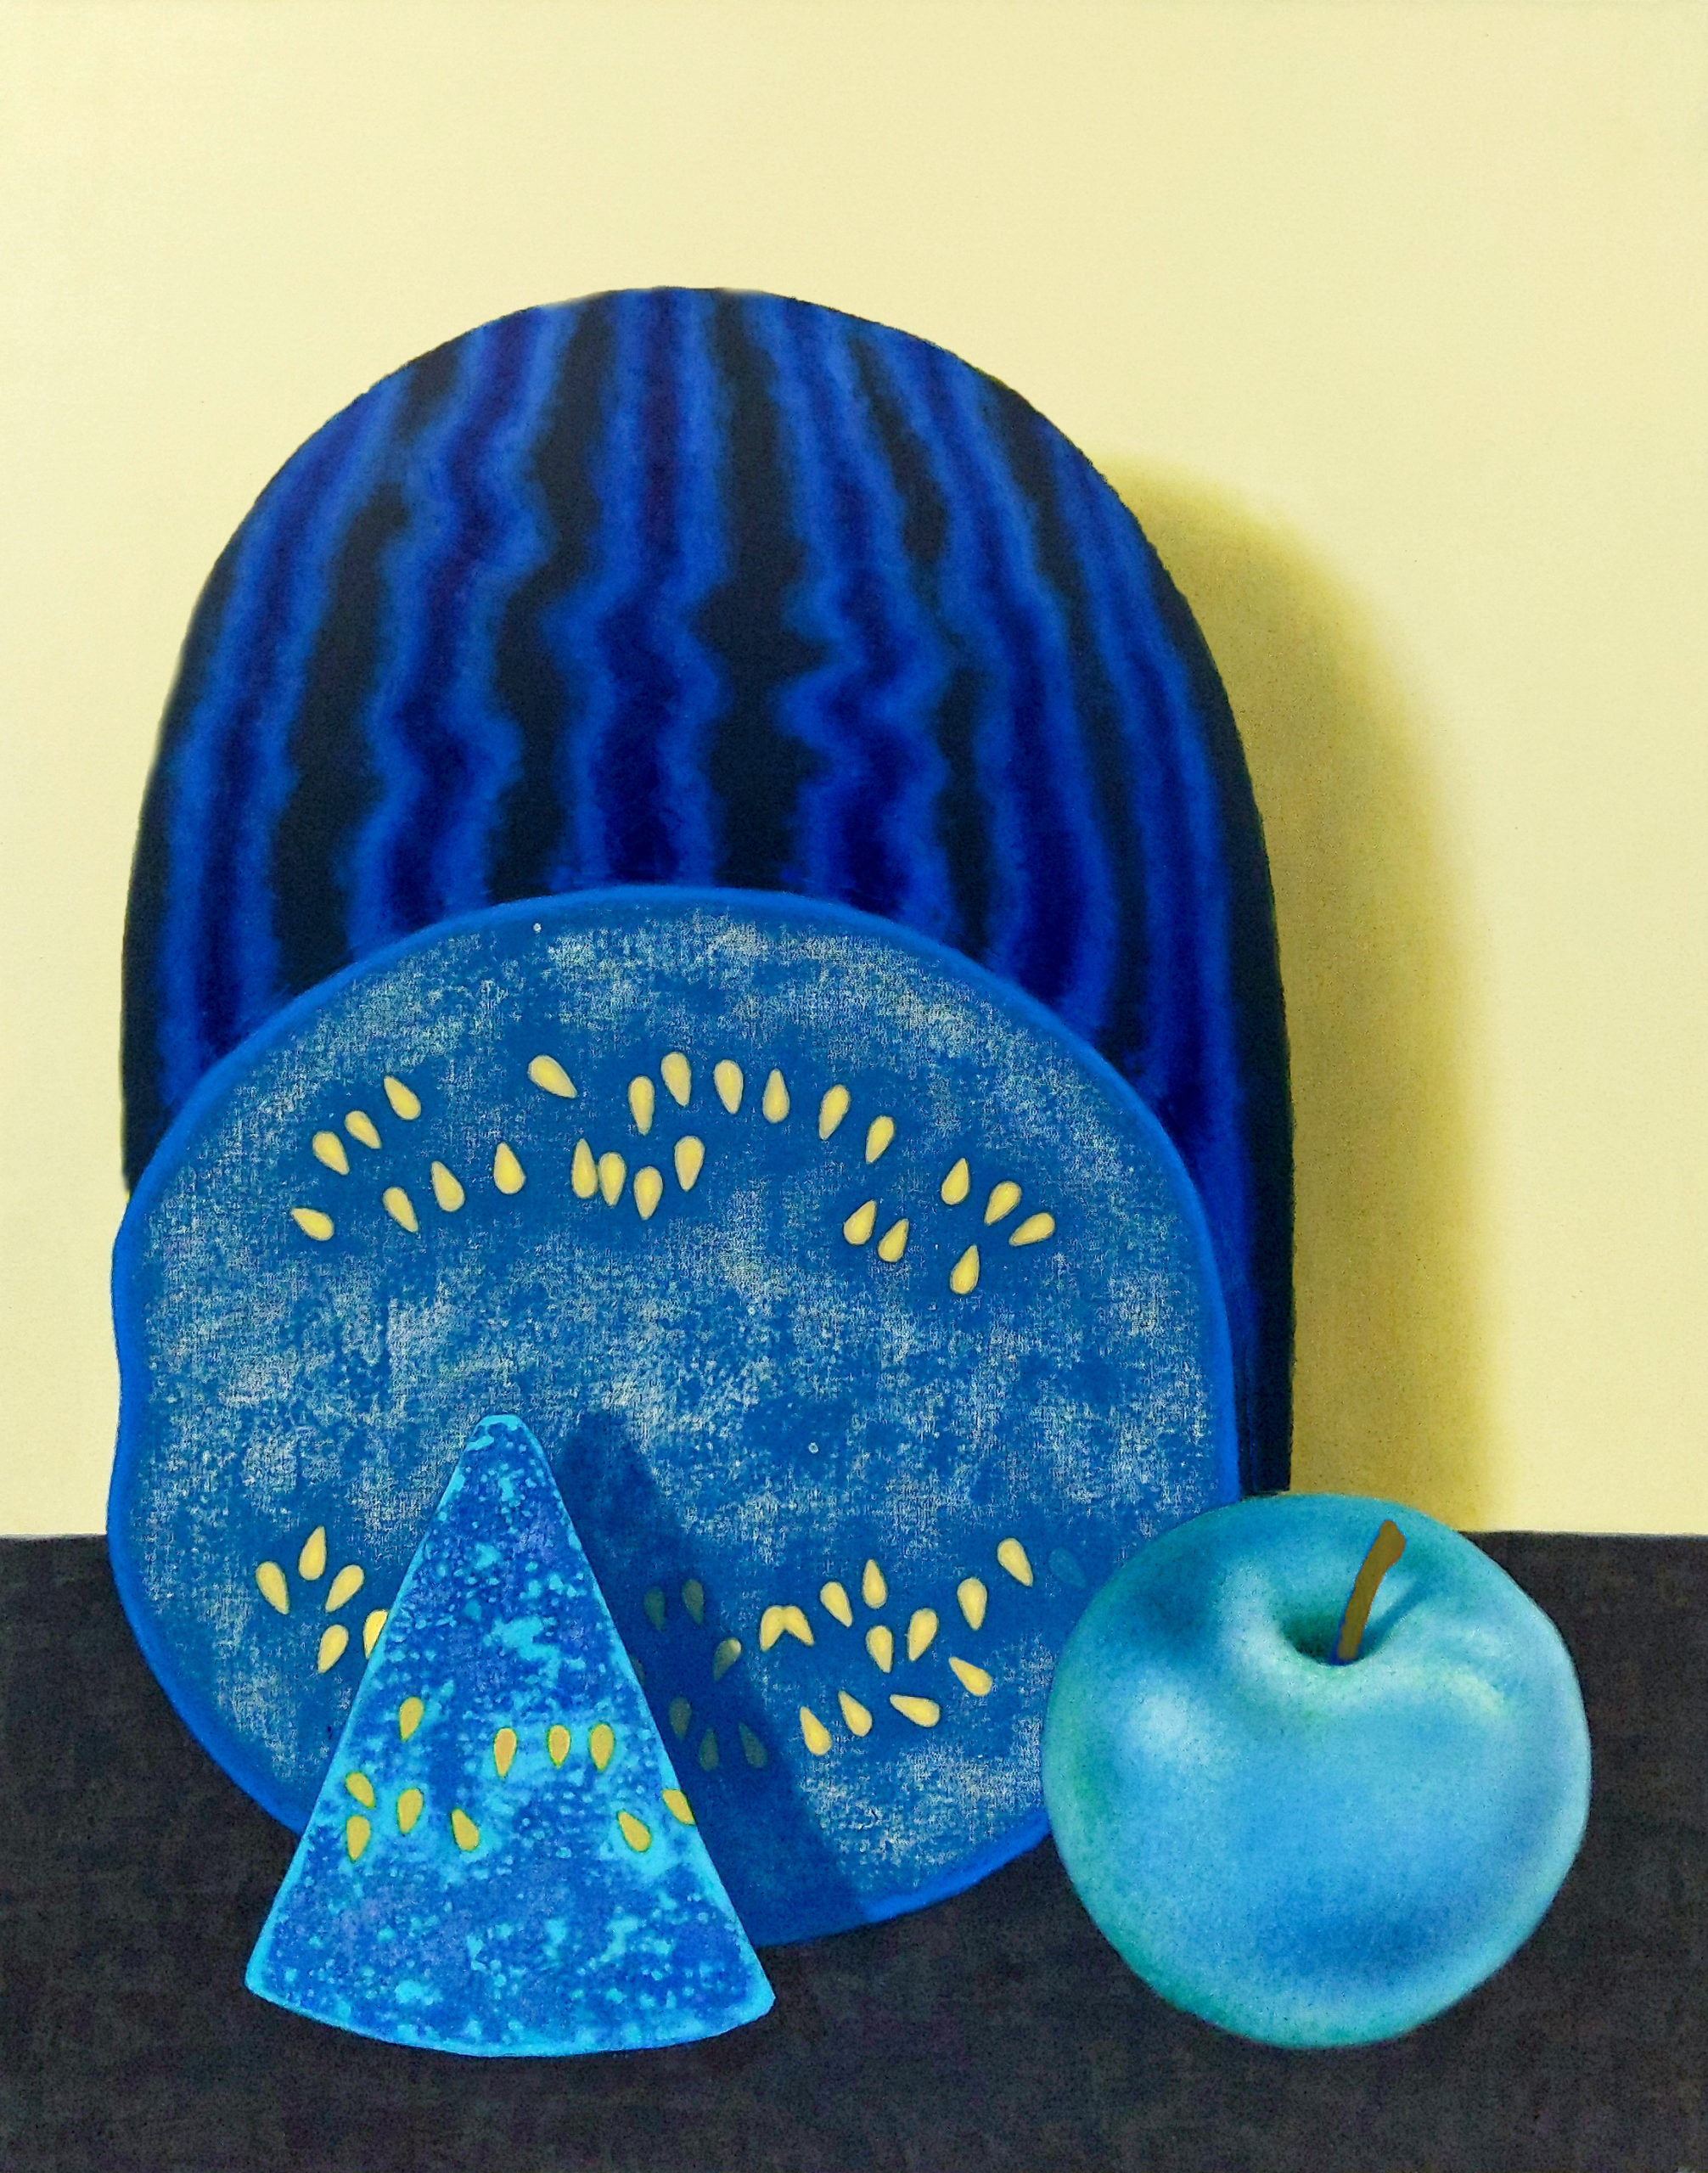 Amanda Baldwin, Blue Melon, 2020. Courtesy the artist